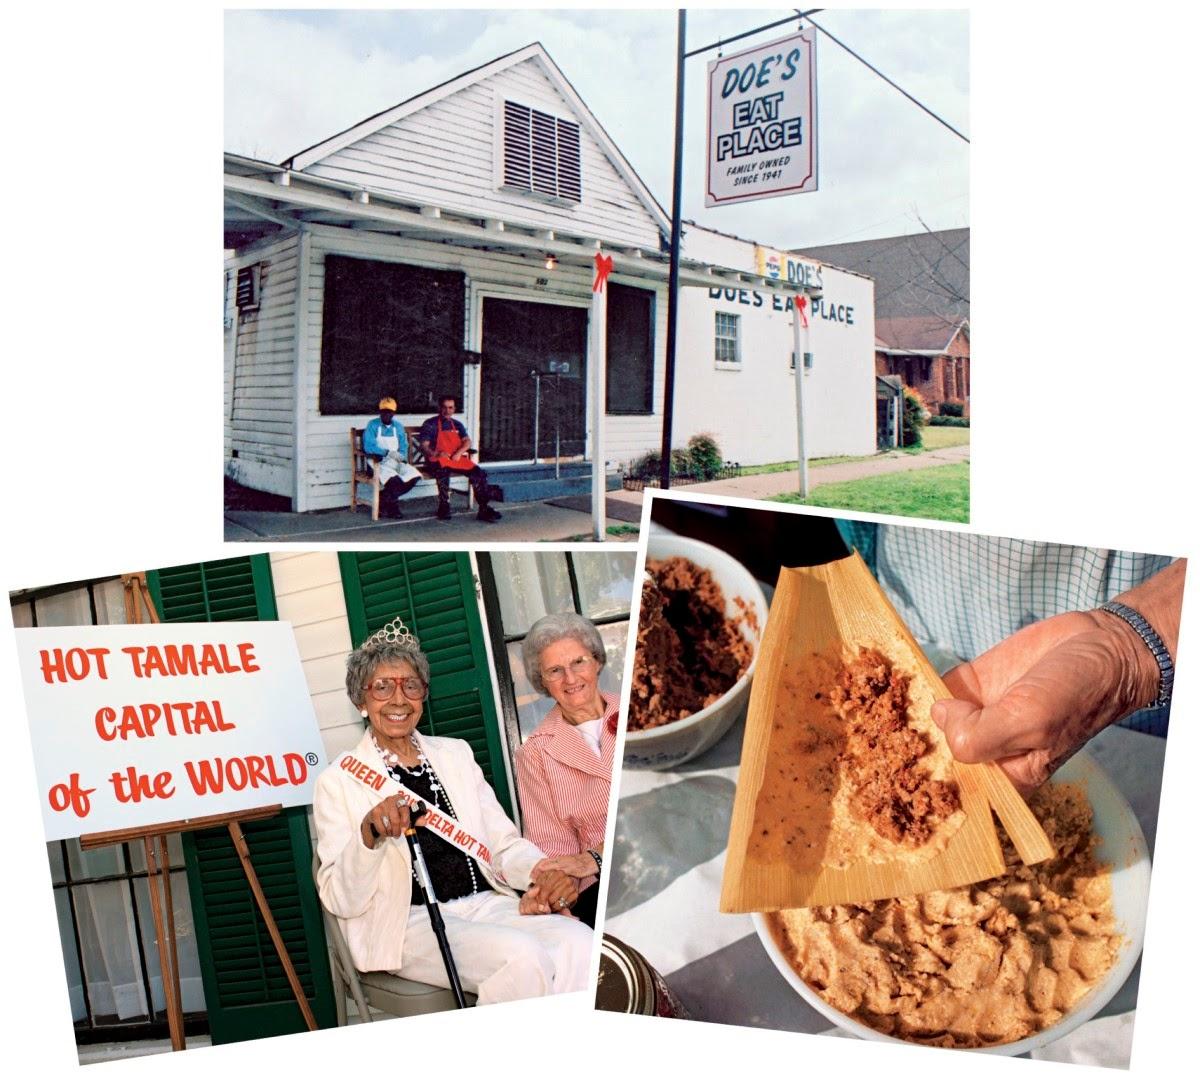 http://www.newyorker.com/magazine/2014/01/06/tamales-on-the-delta